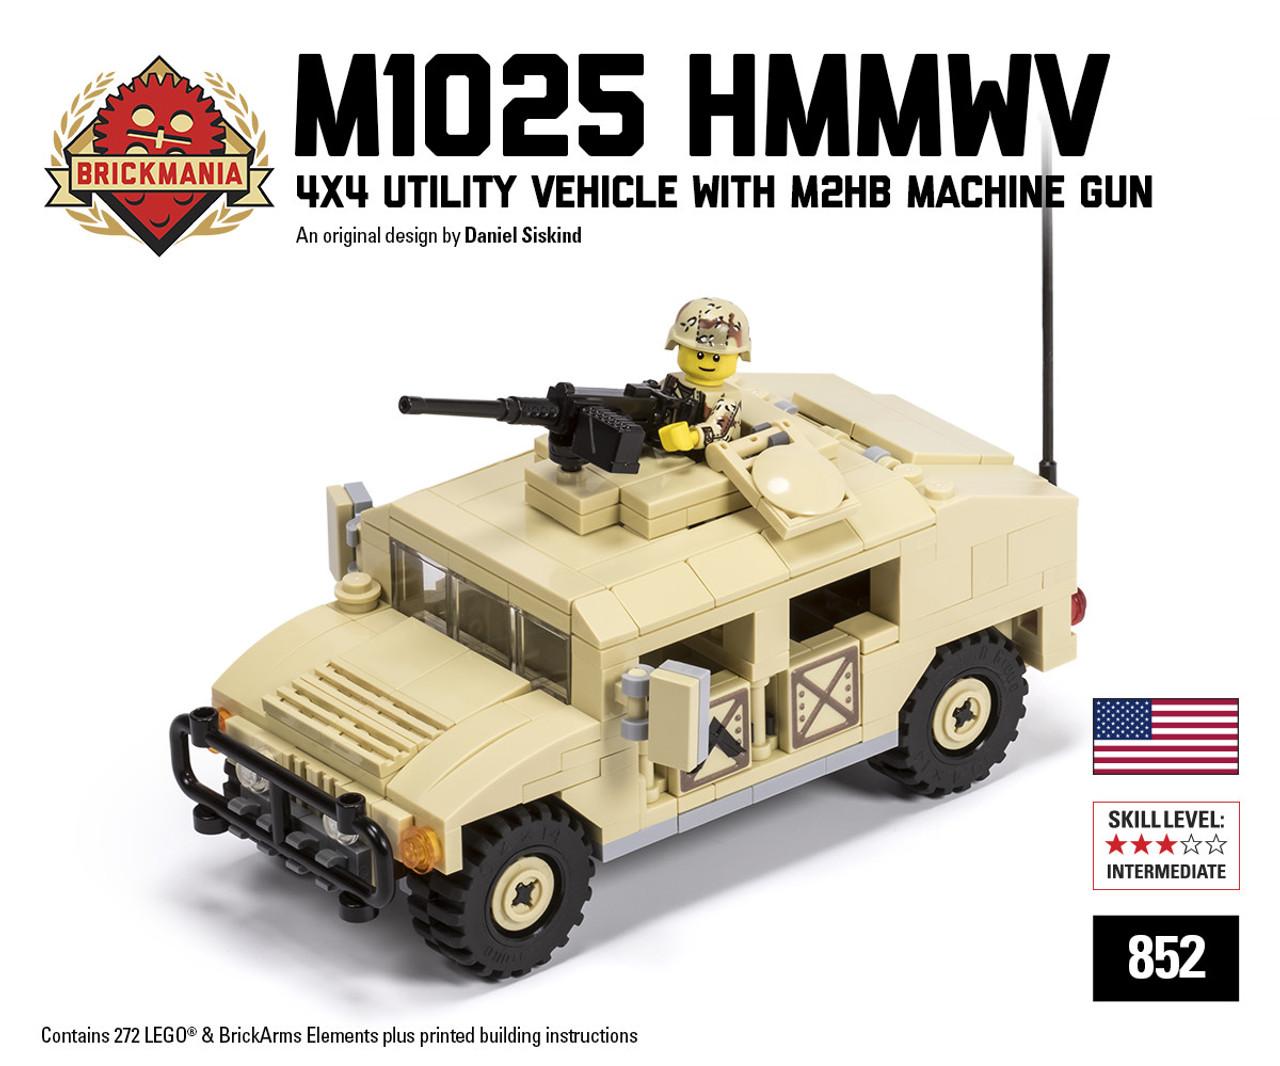 M1025 HMMWV - 4x4 Utility Vehicle with M2HB Machine Gun